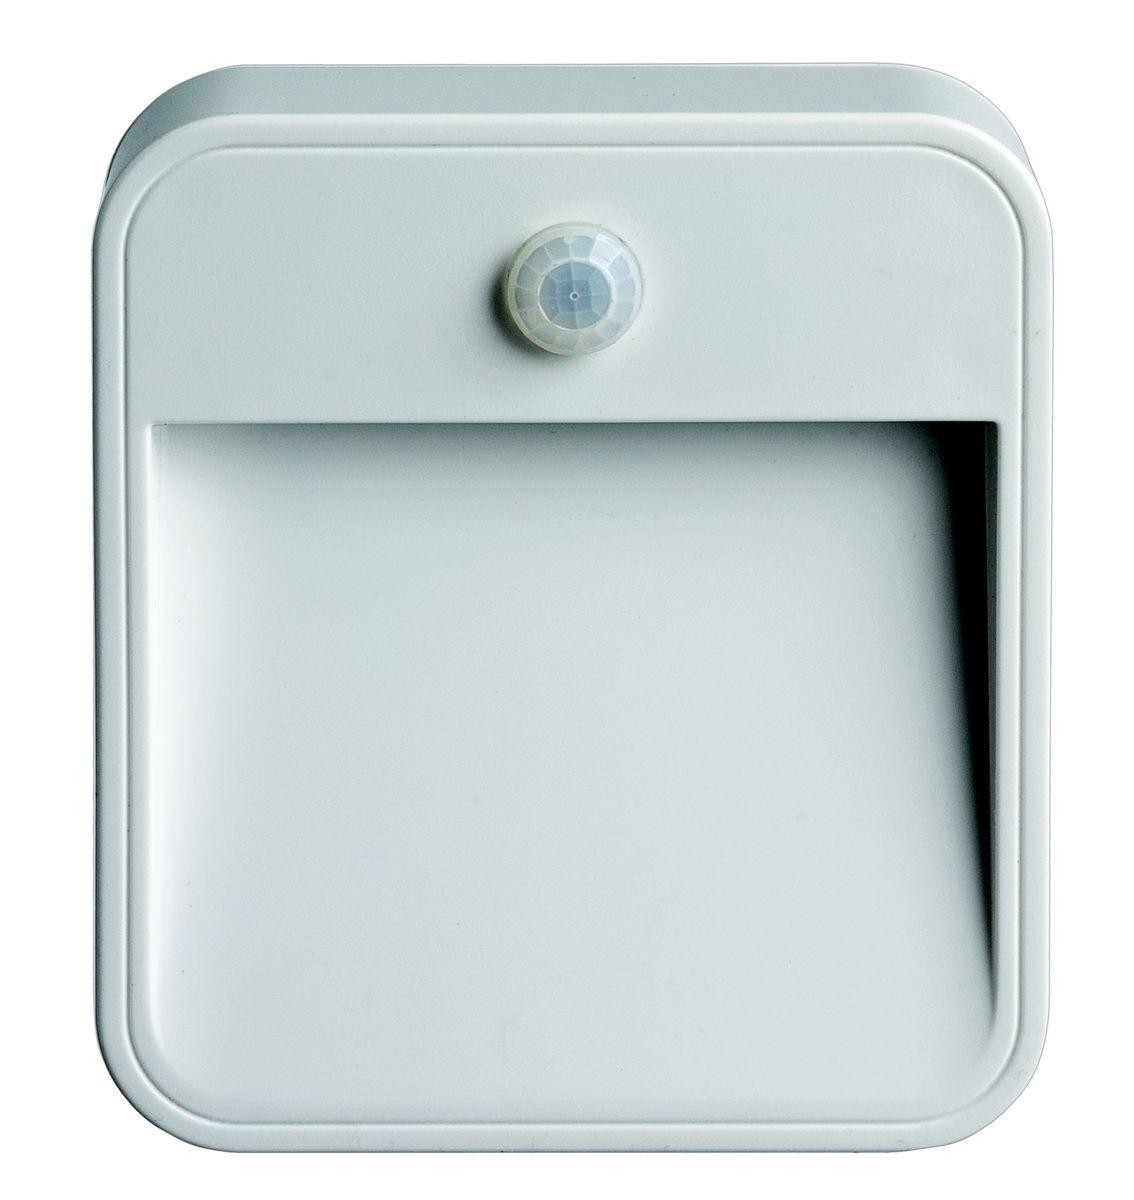 mr beams stick anywhere wireless motion sensor led night lights white - Led Motion Sensor Light